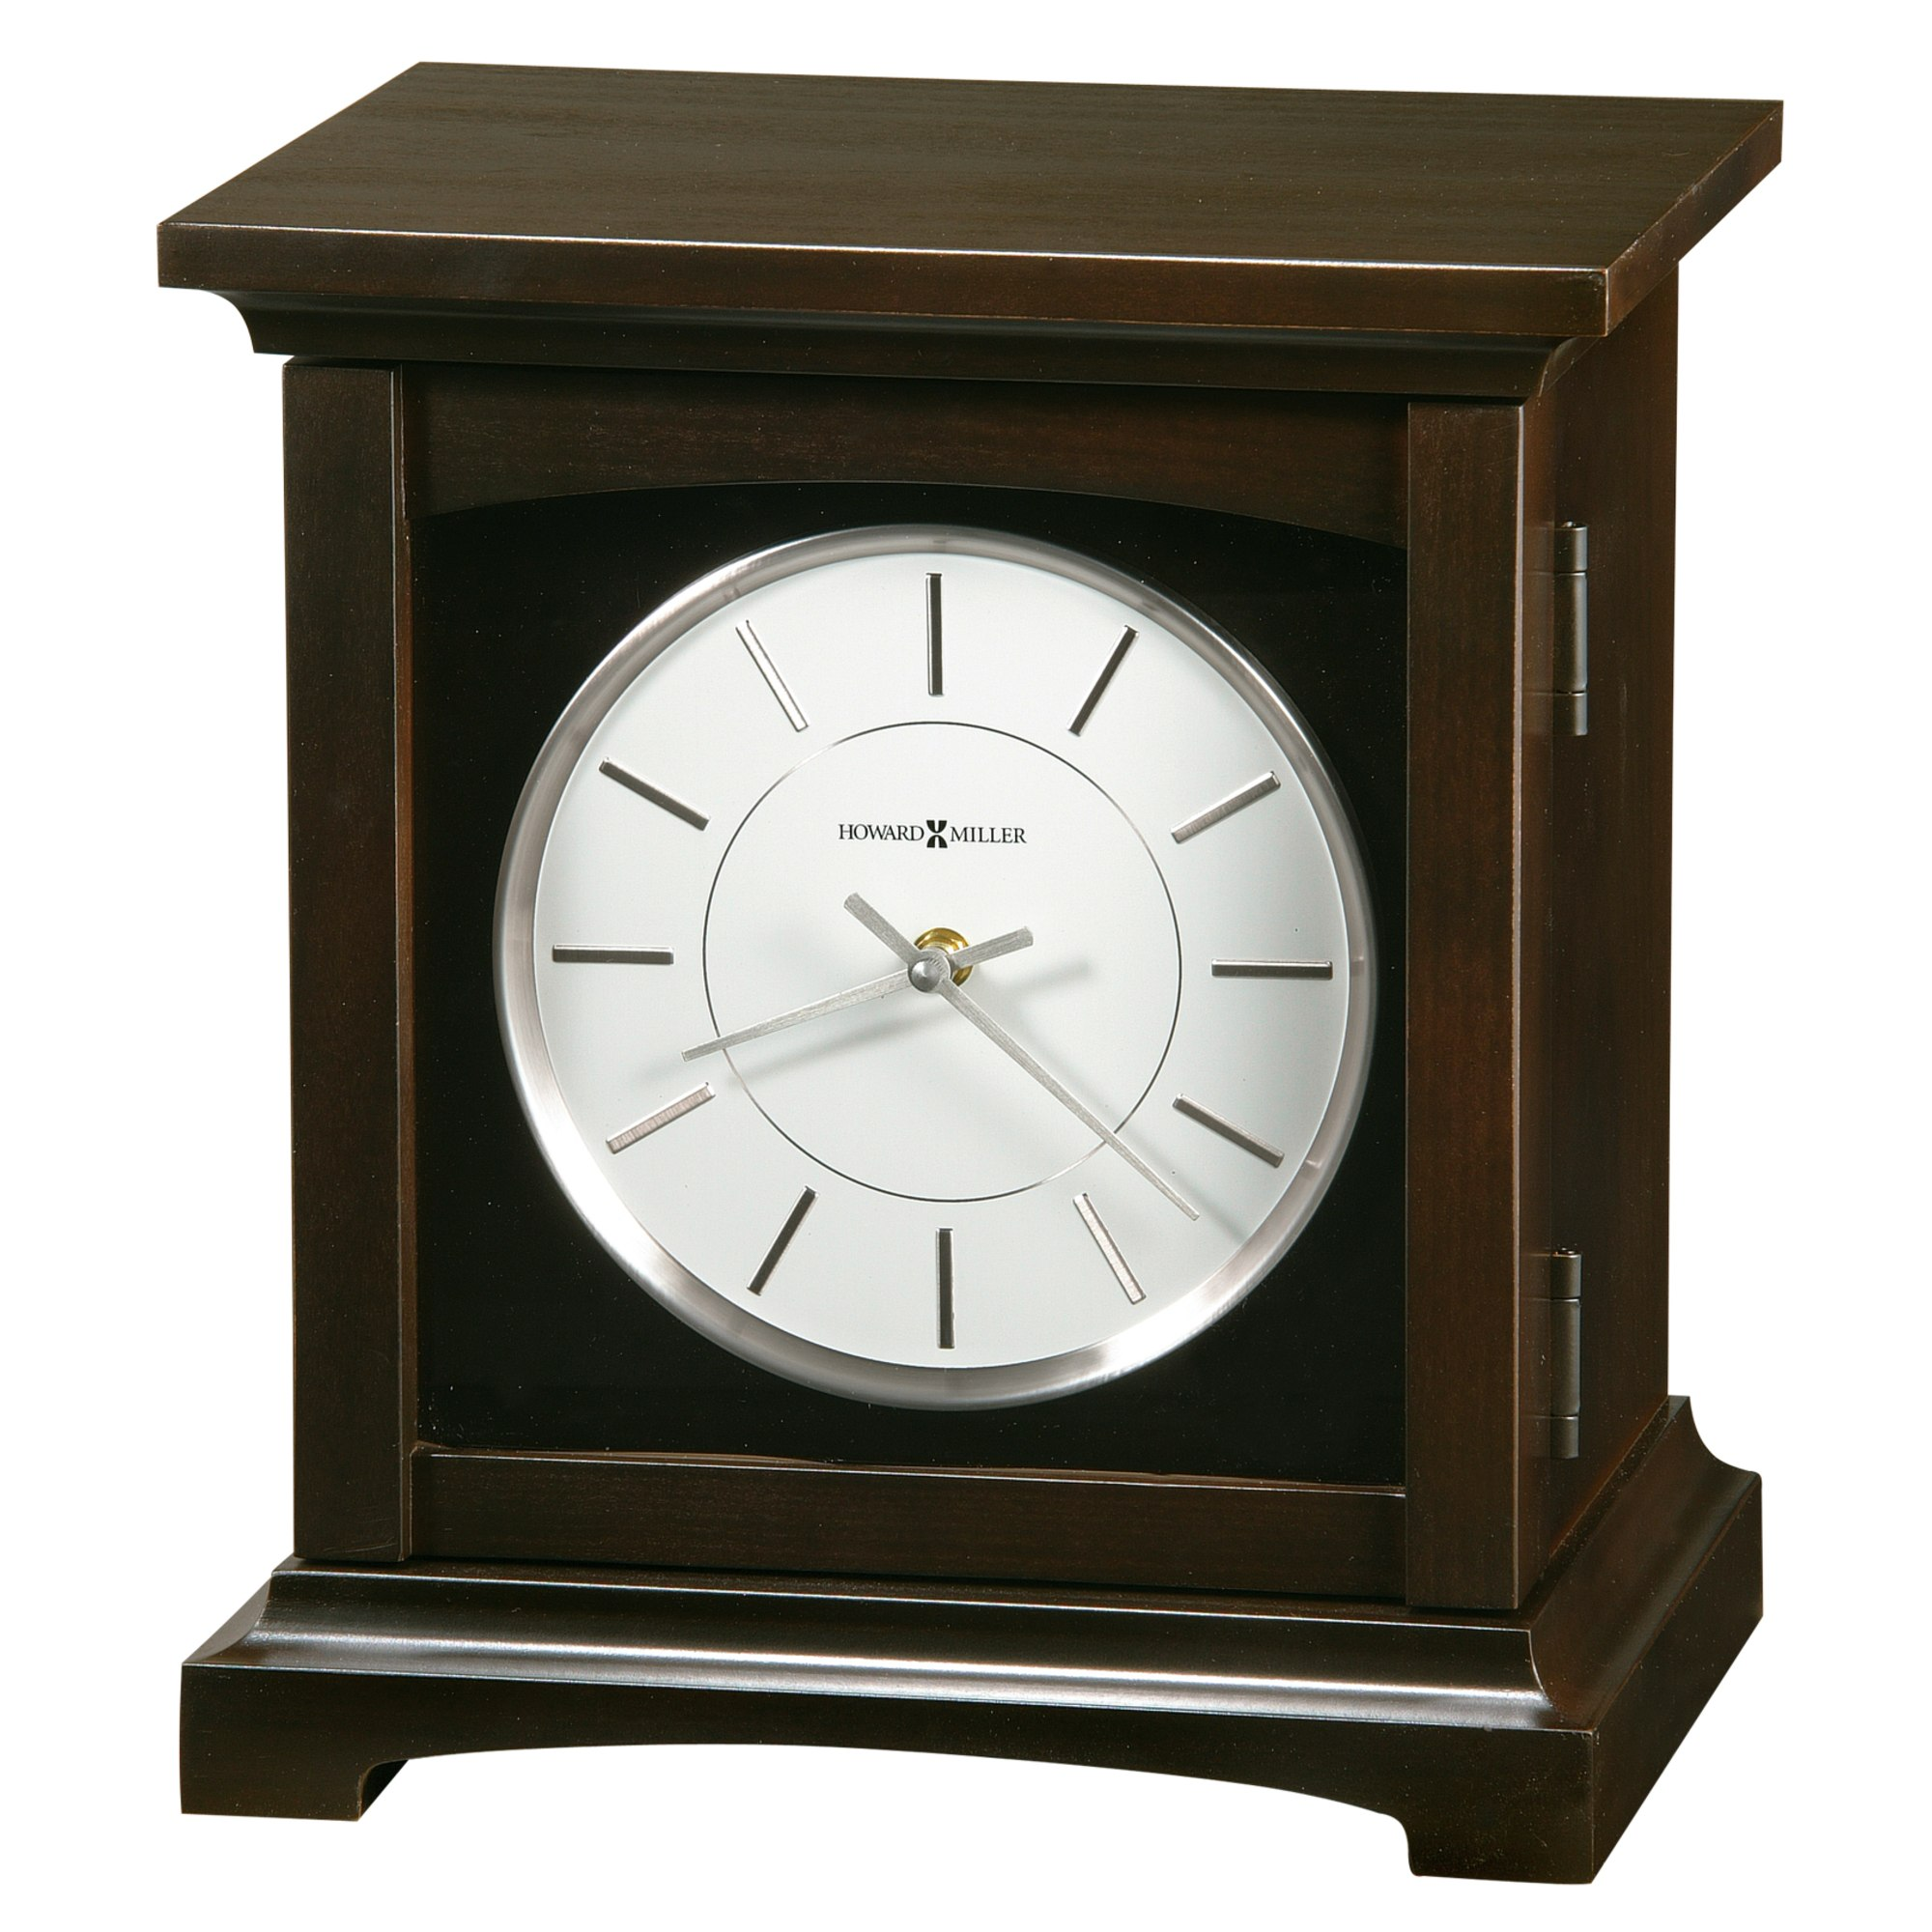 Image for 800-139 Tribute Mantel Clock Urn from Howard Miller Official Website